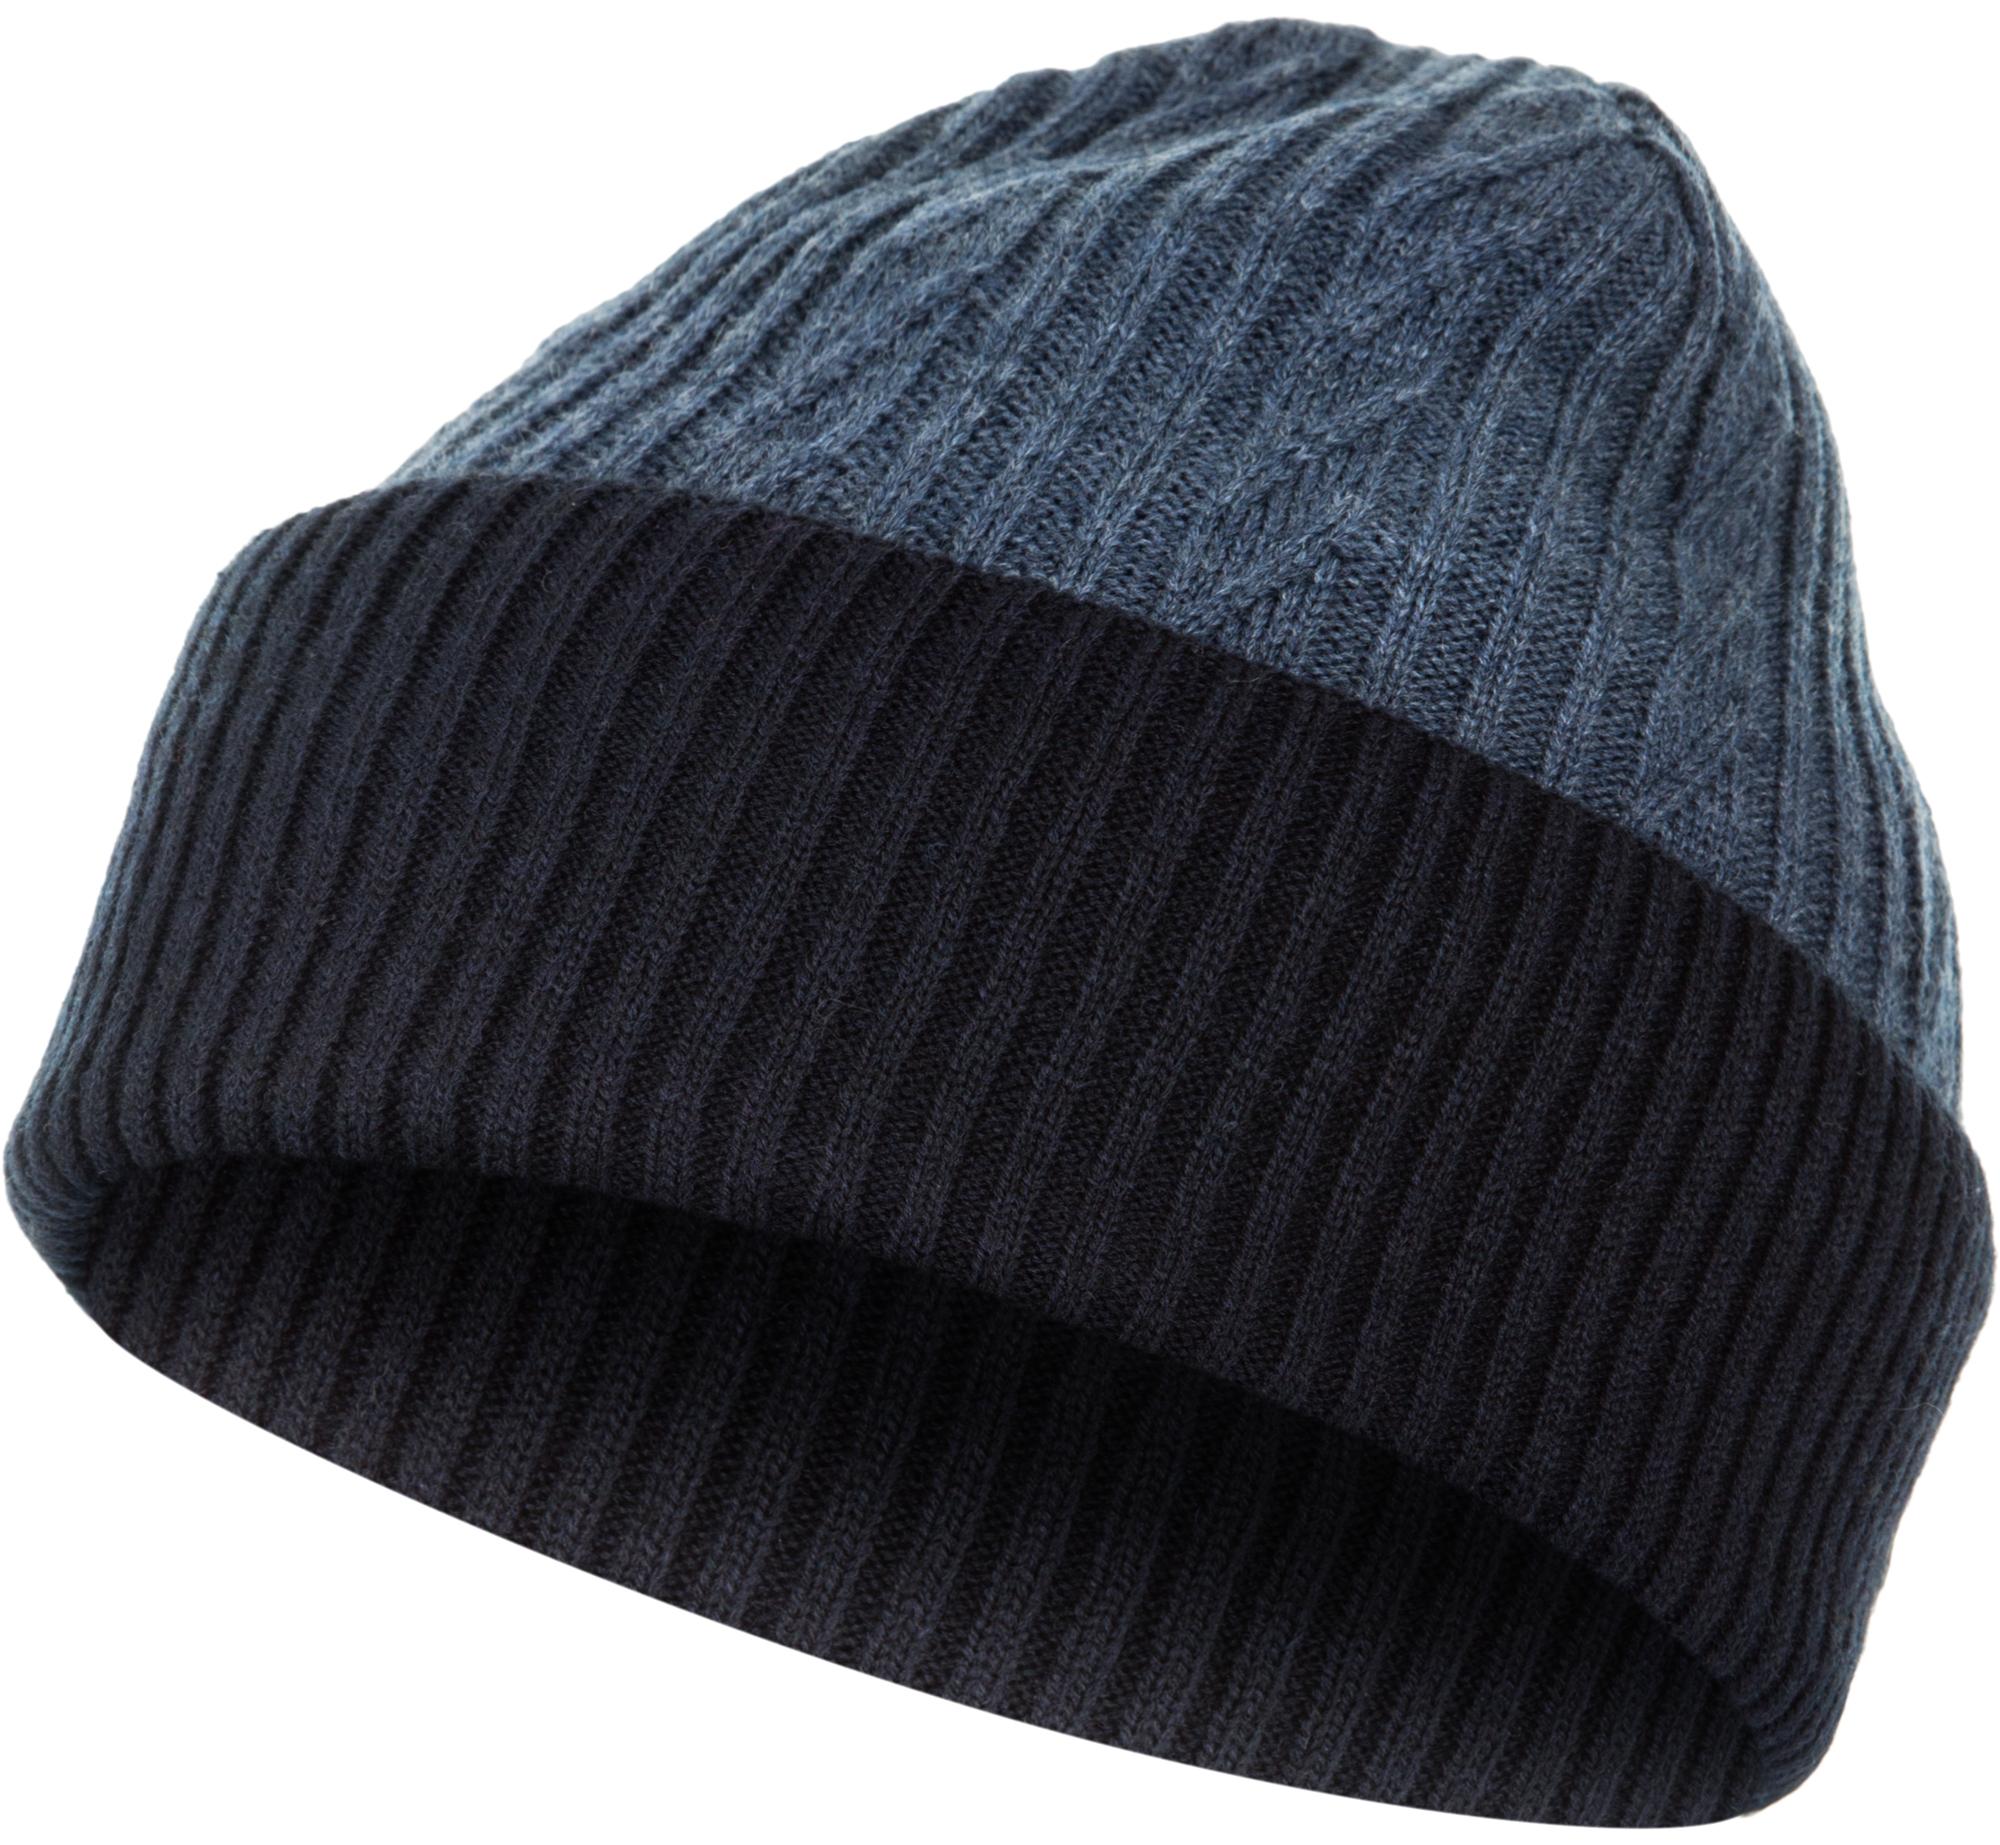 Outventure Шапка мужская Outventure, размер Без размера outventure шапка мужская outventure размер без размера